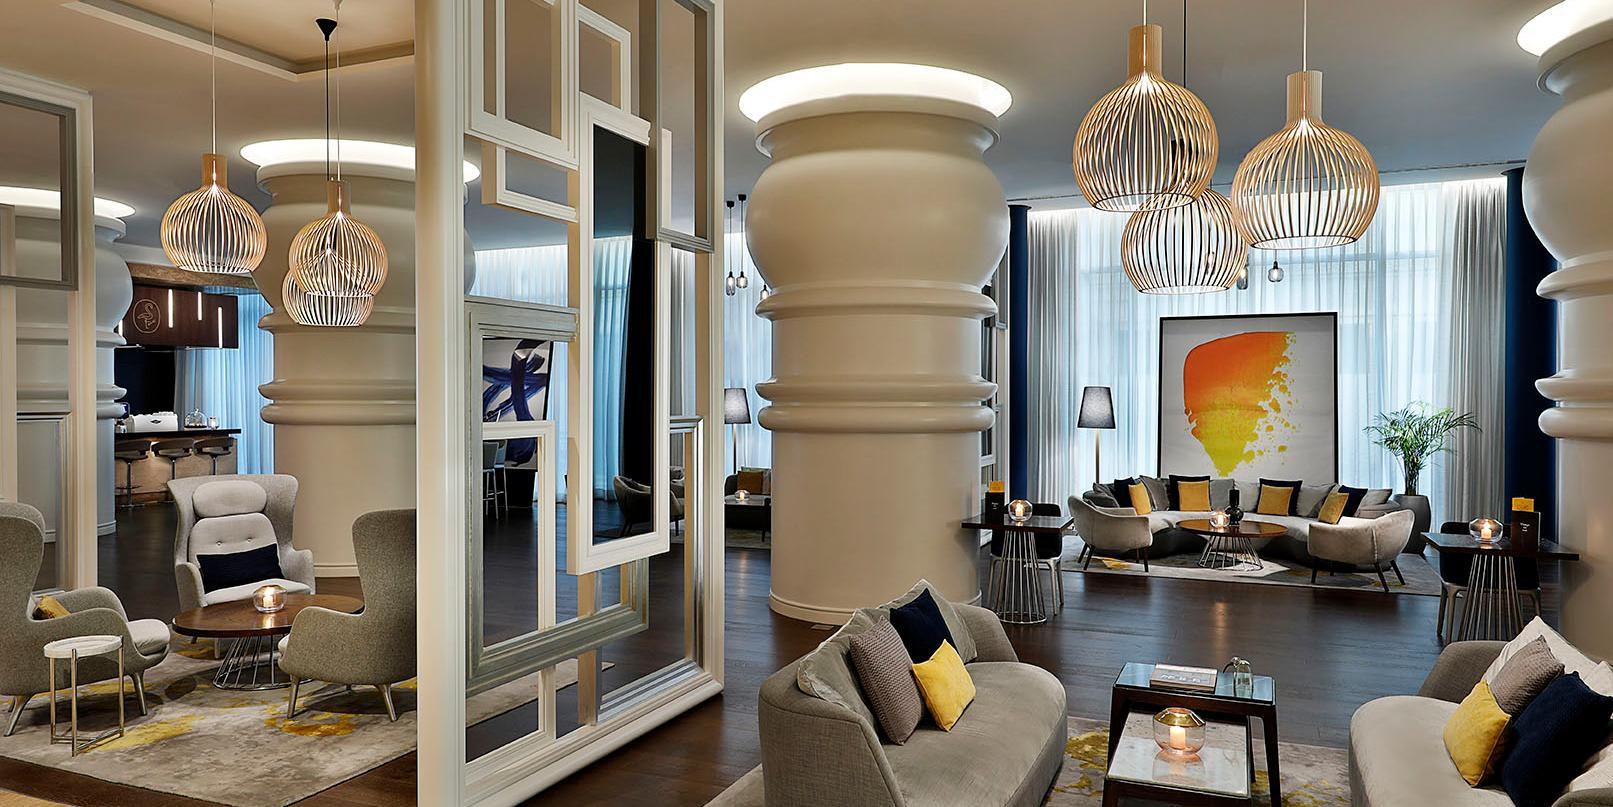 The Lounge, voco Dubai, Sheikh Zayed Road, near DIFC